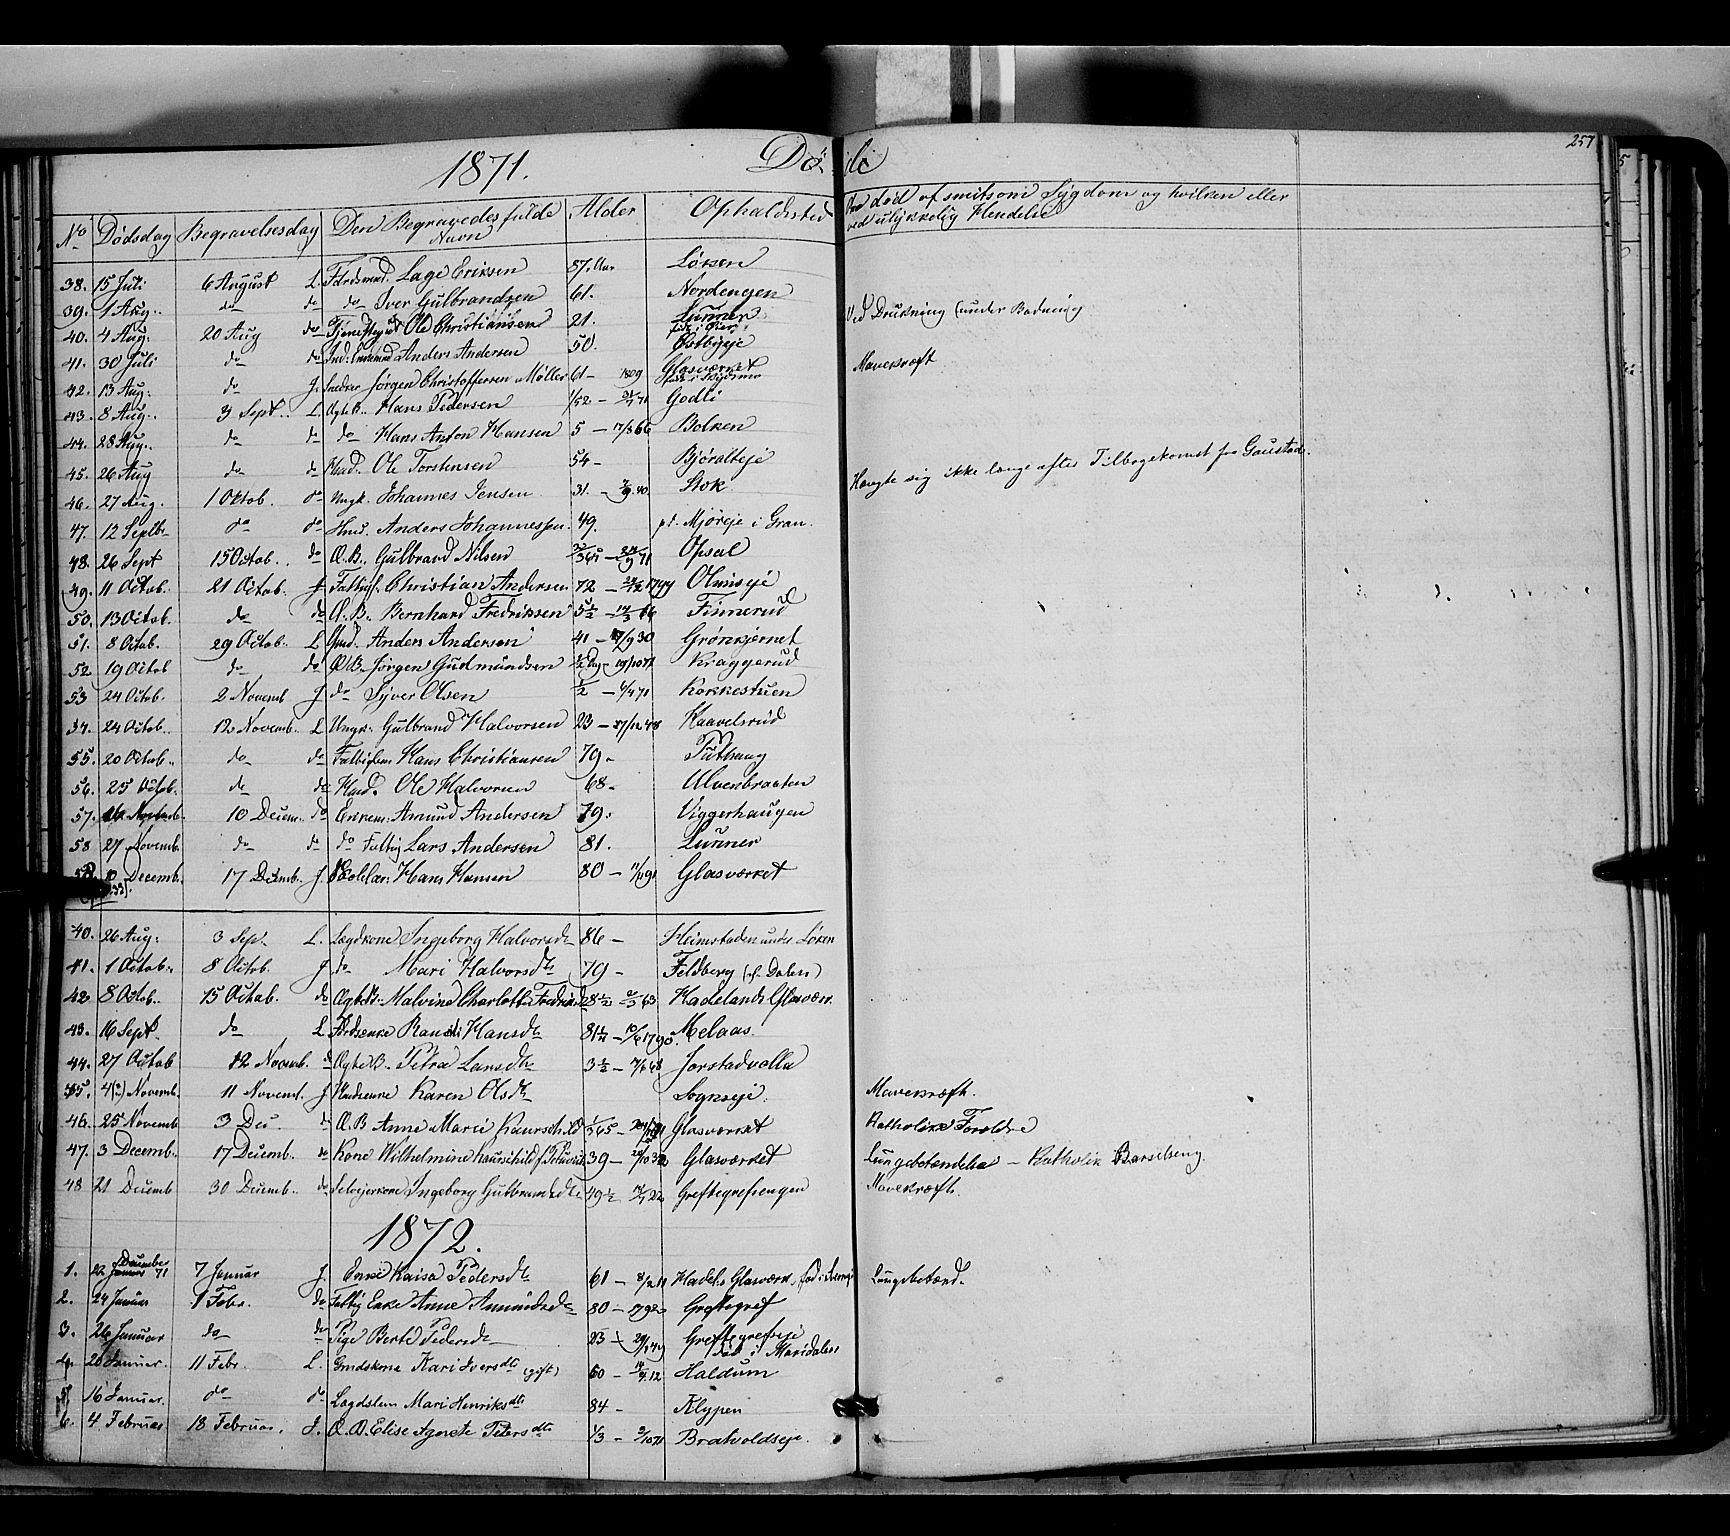 SAH, Jevnaker prestekontor, Ministerialbok nr. 7, 1858-1876, s. 257